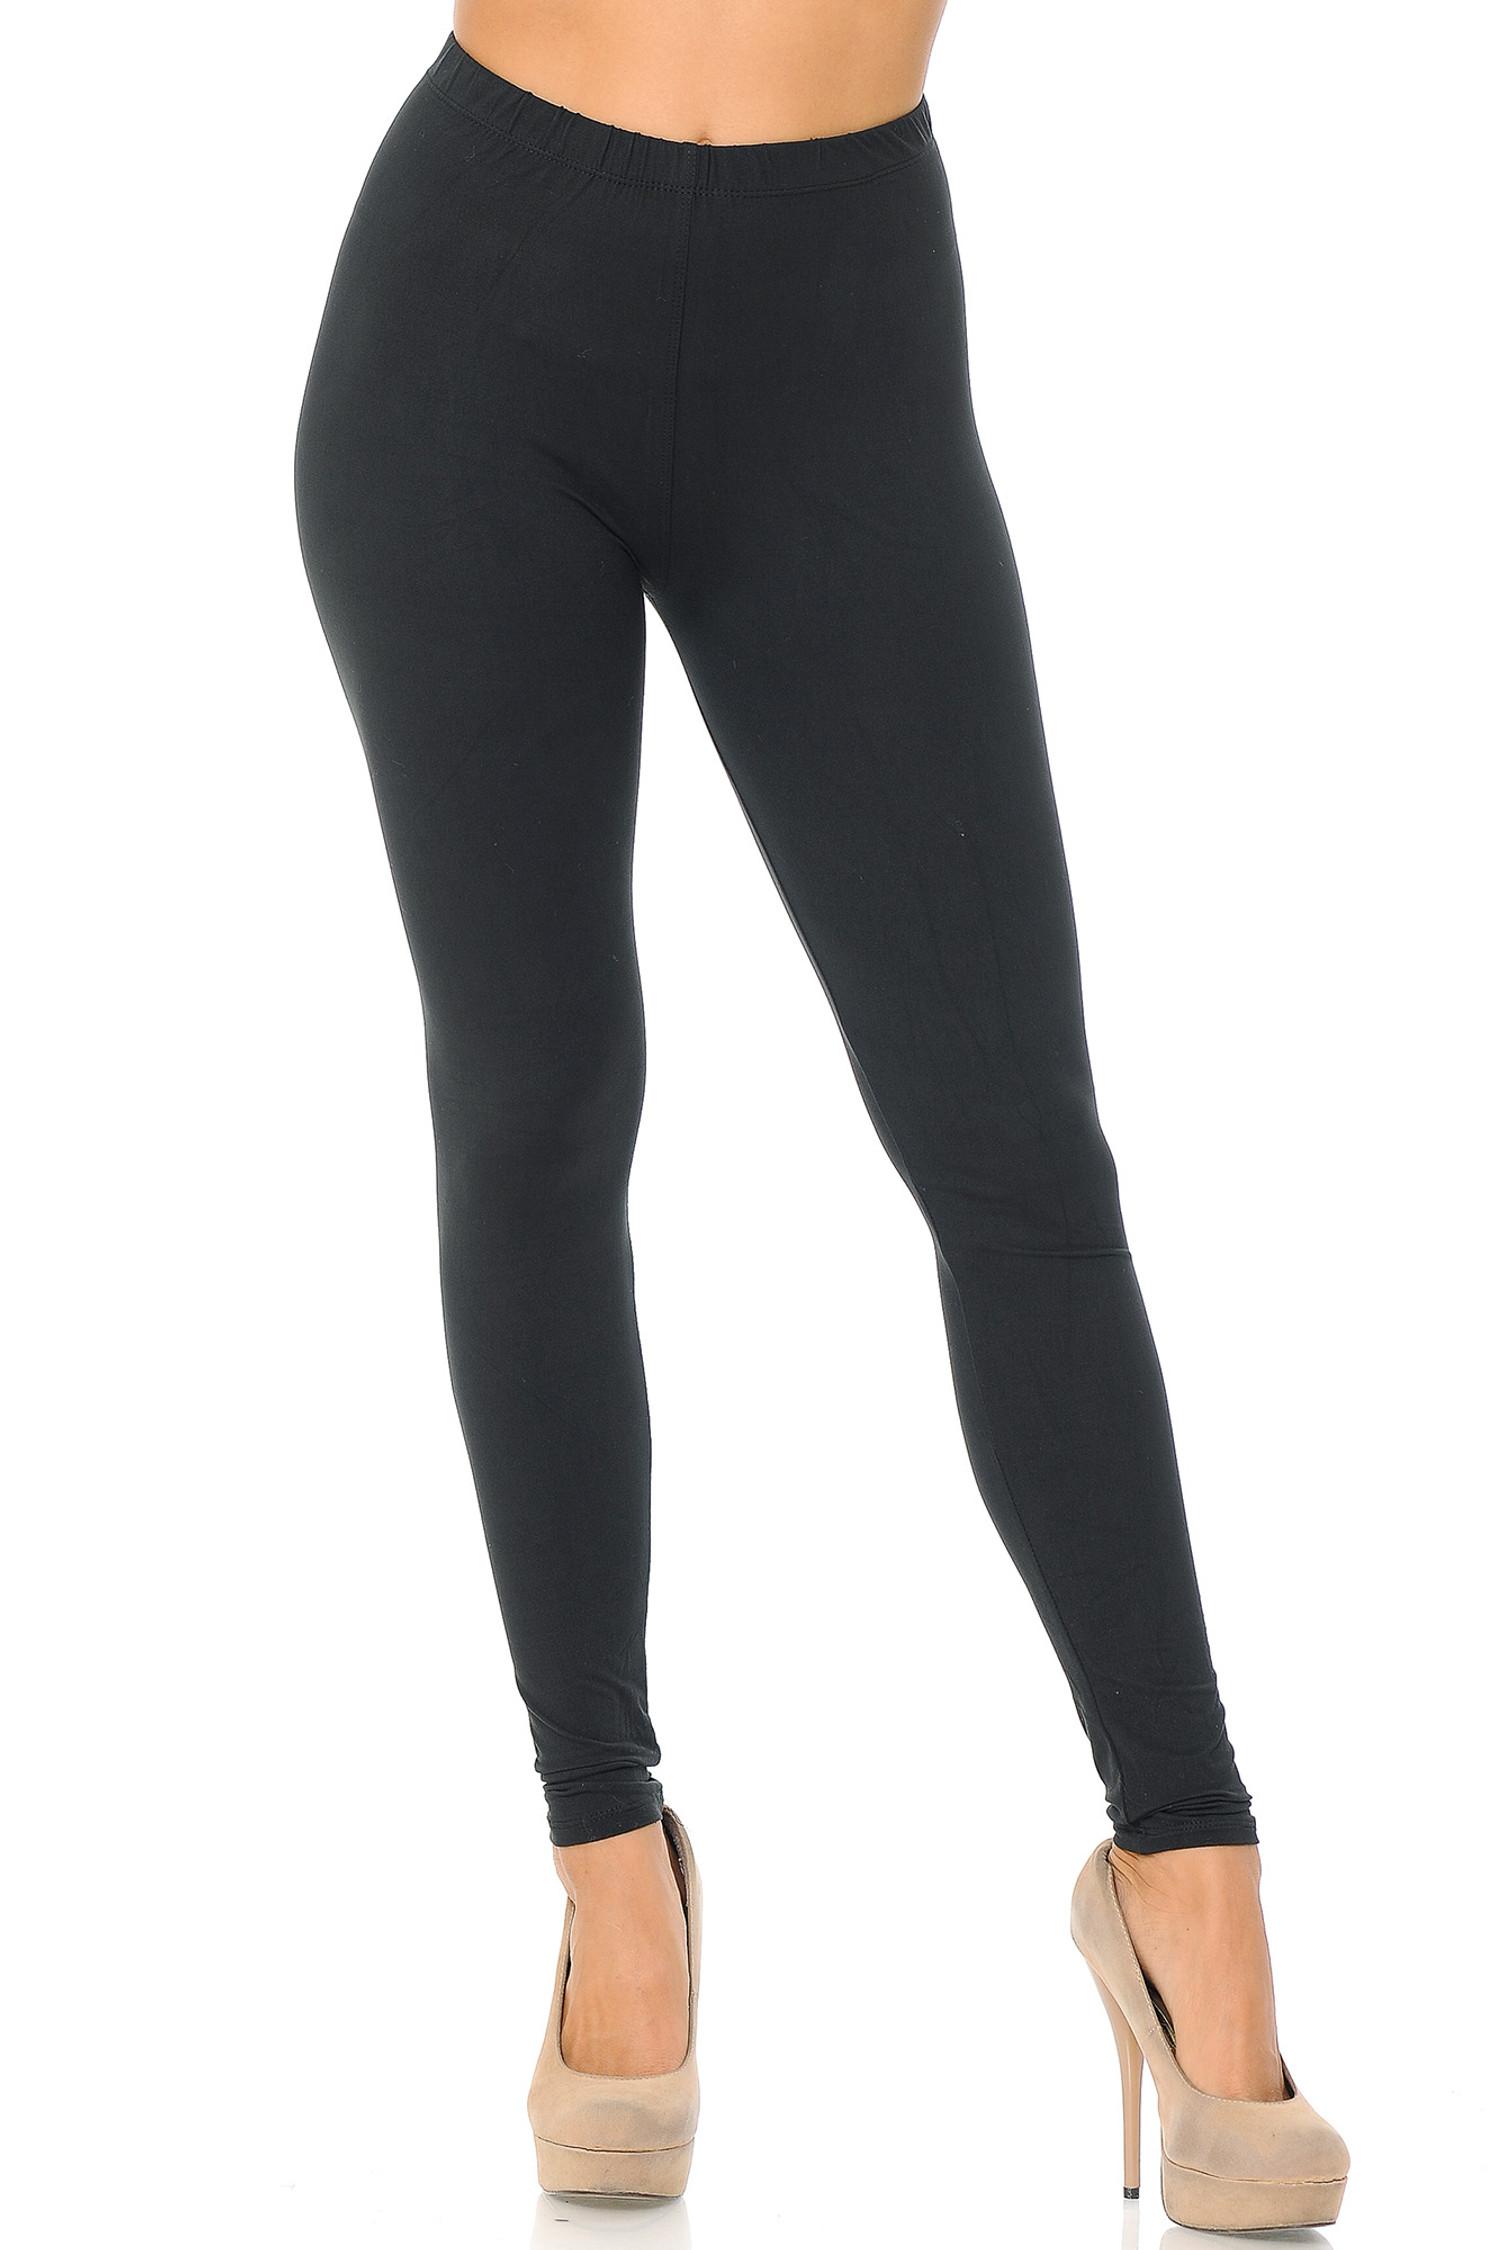 Black Front Brushed Basic Solid Leggings - EEVEE